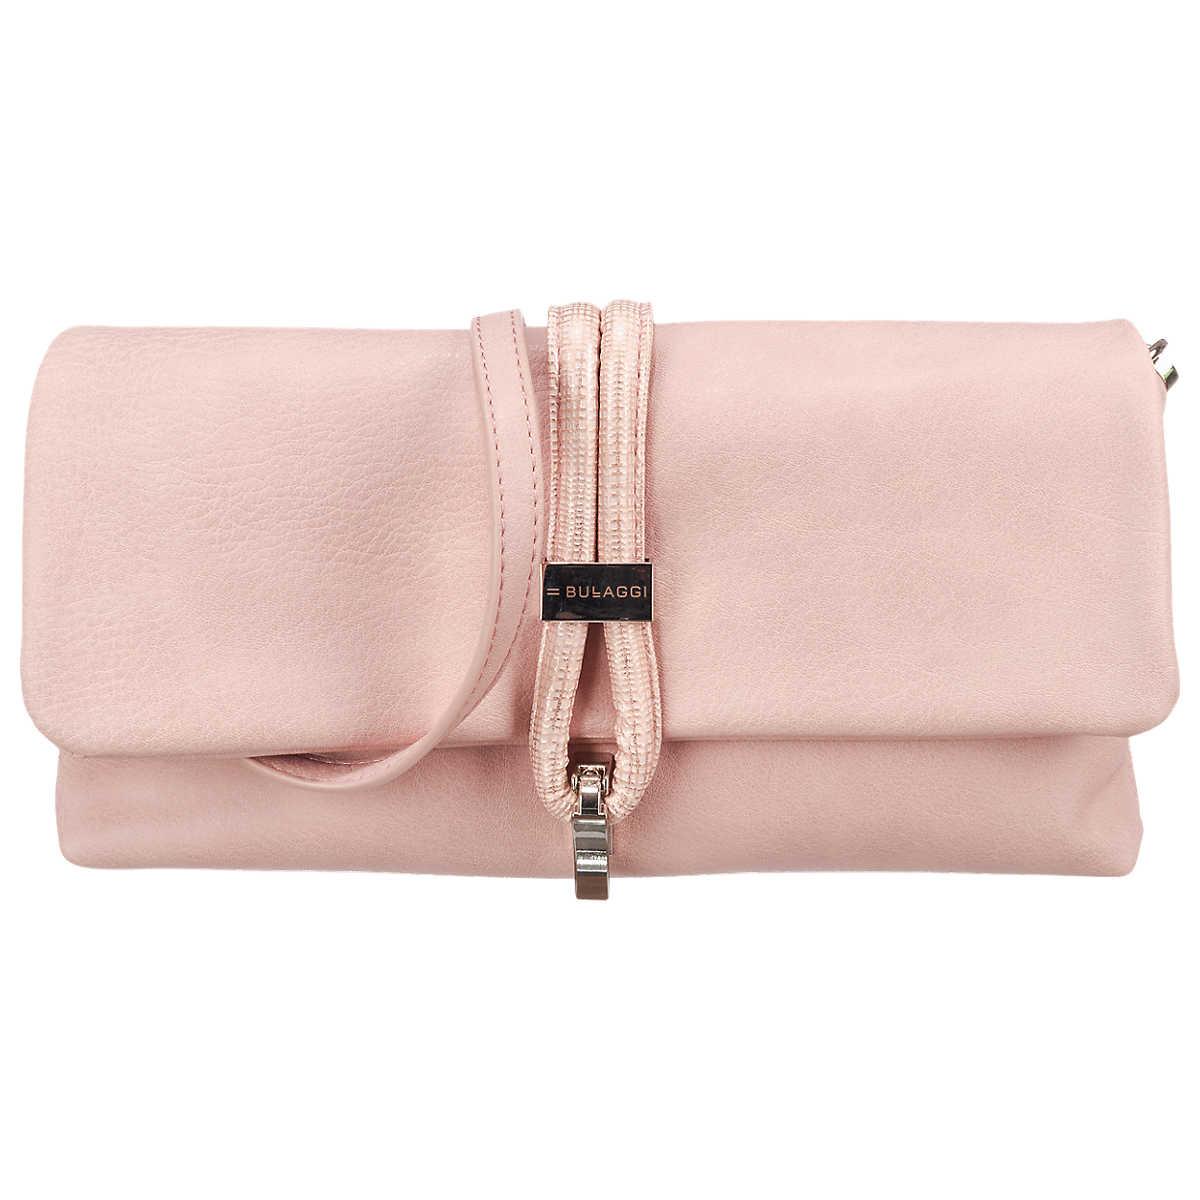 BULAGGI Cybis Abendtasche rosa - BULAGGI - Clutch & Abendtaschen - Taschen - mirapodo.de